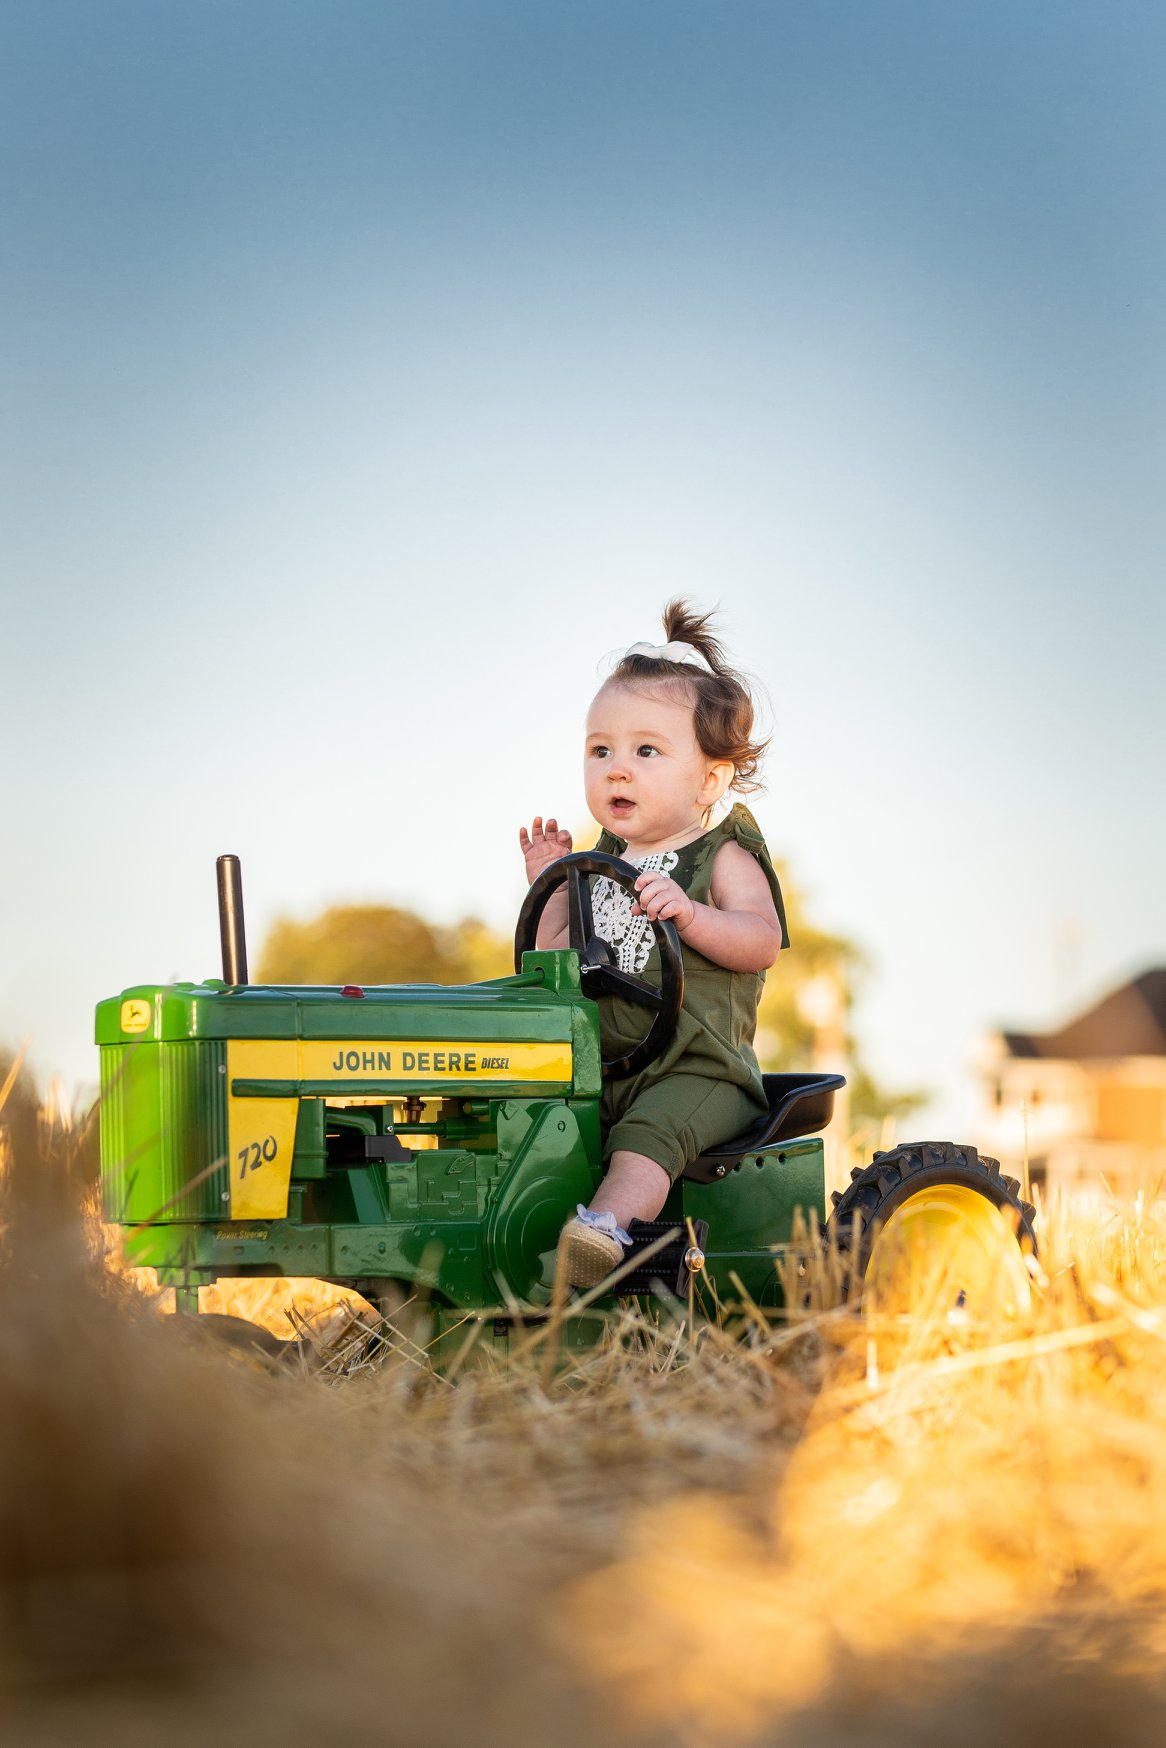 Jodie-Aldred-Photography-Chatham-Kent-Elgin-Middlesex-London-Ontario-Farm-Family-baby-john-deere.jpg